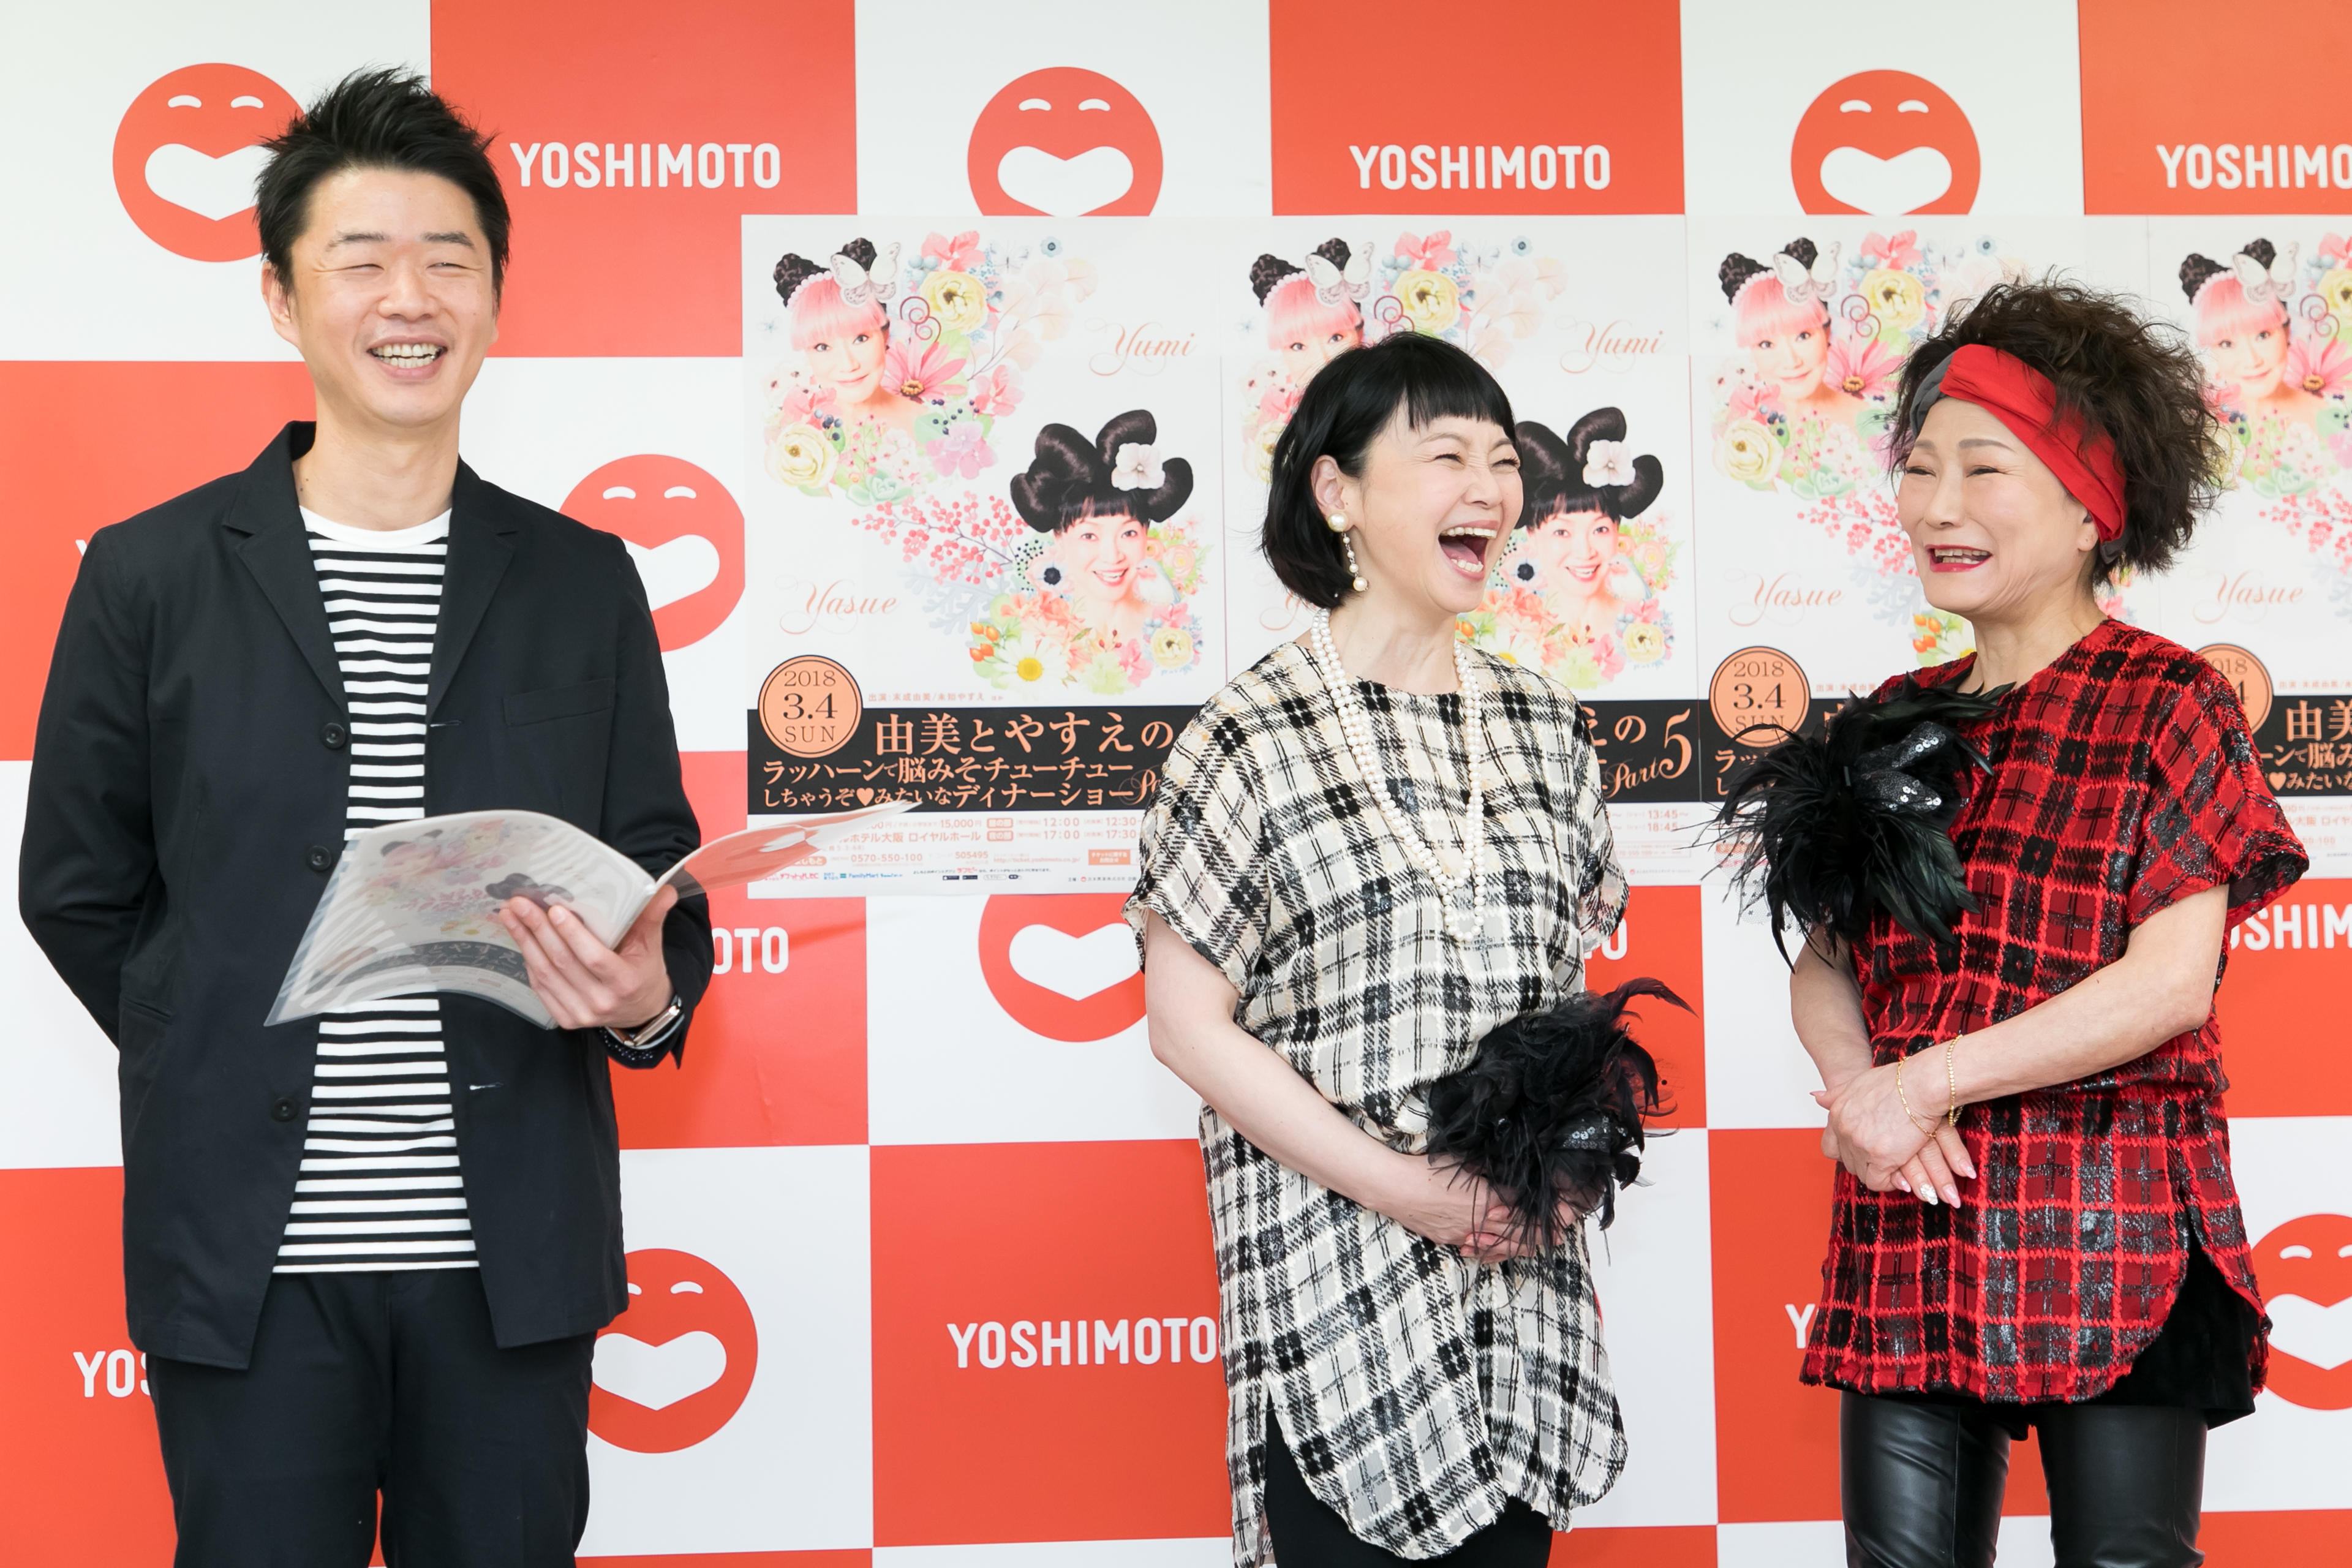 http://news.yoshimoto.co.jp/20171219144252-67293ae93963ad8dbeae2e52ce6e07bb7d46779e.jpg